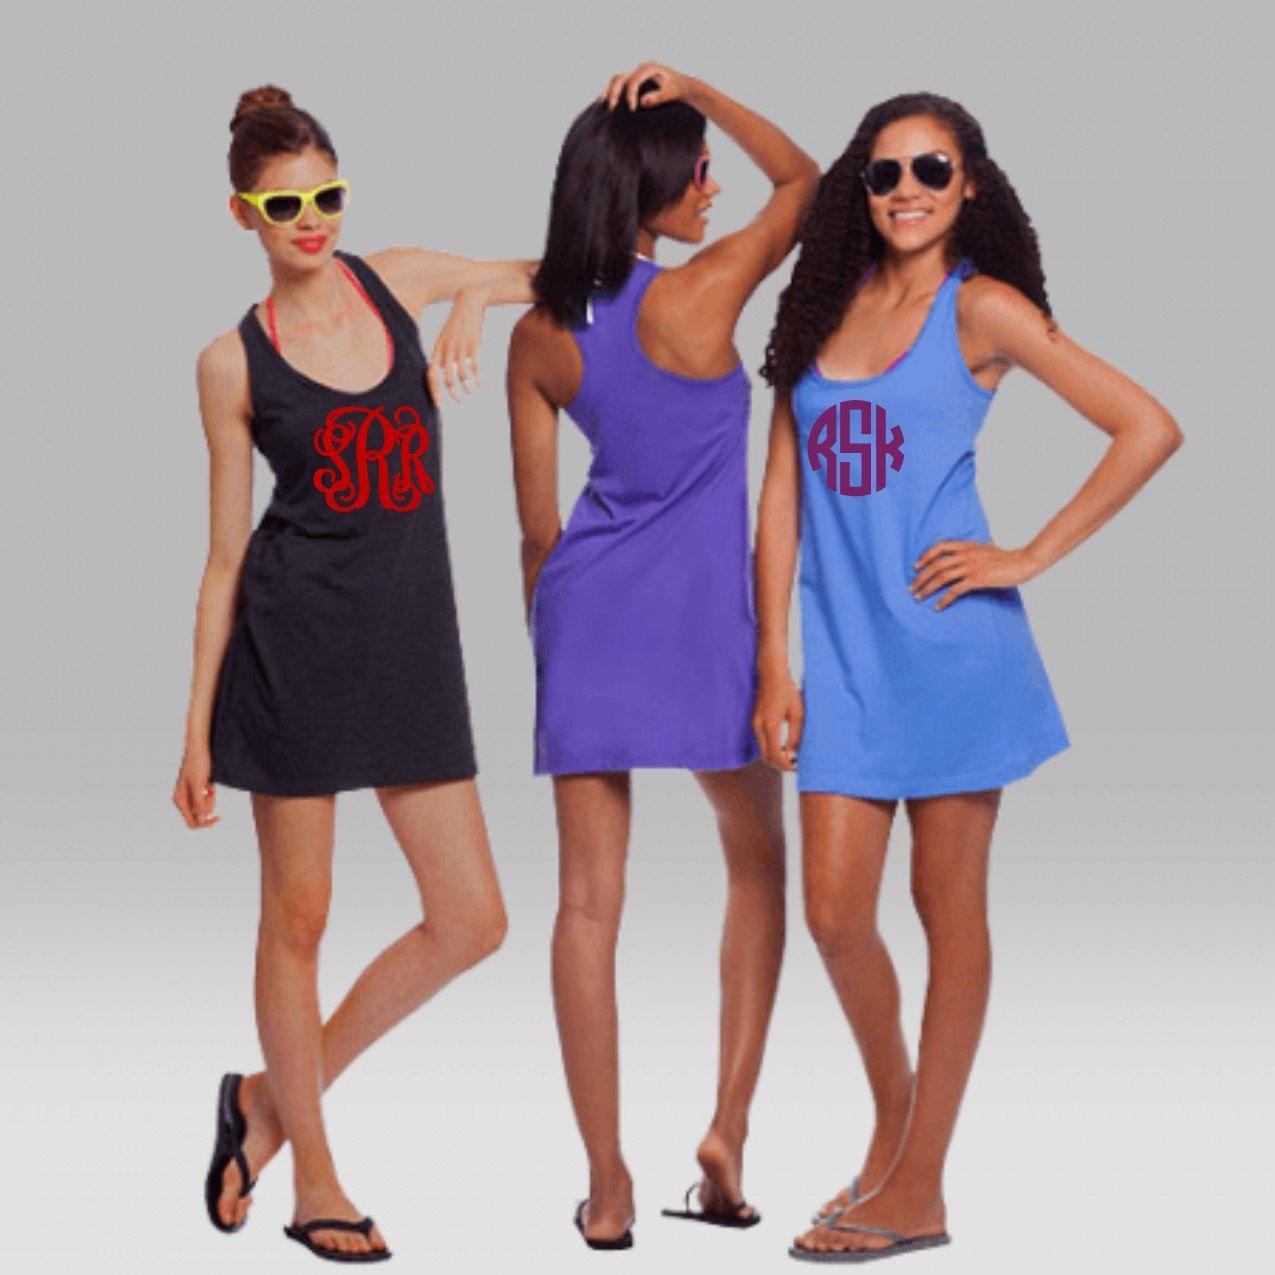 146fa234c3 Monogrammed Swimsuit Coverup Monogrammed Bridesmaid Tank dress Monogrammed  Wedding Sleep wear Women Teens Beach cover up